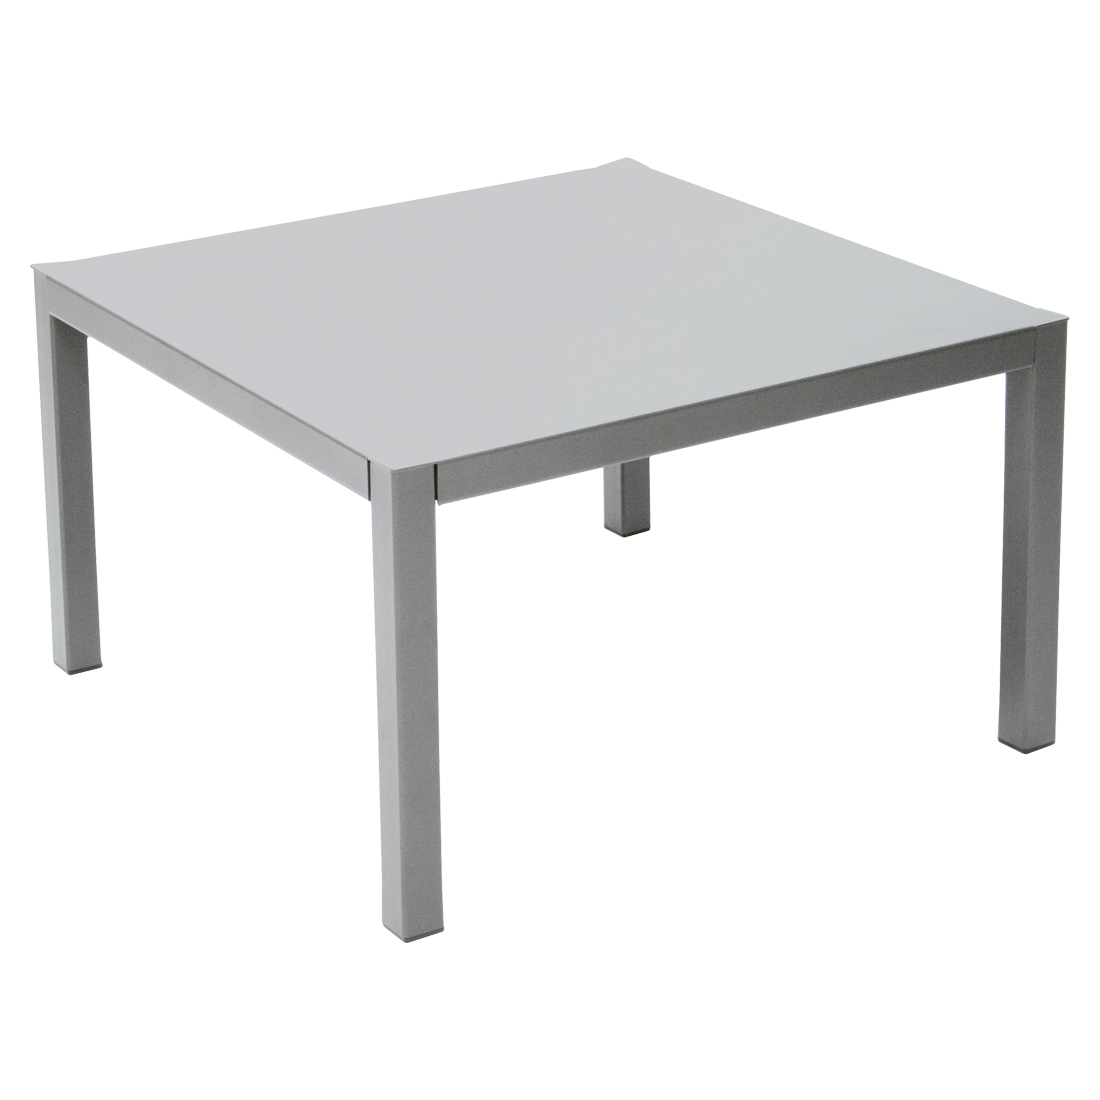 table basse lumineuse outdoor. Black Bedroom Furniture Sets. Home Design Ideas